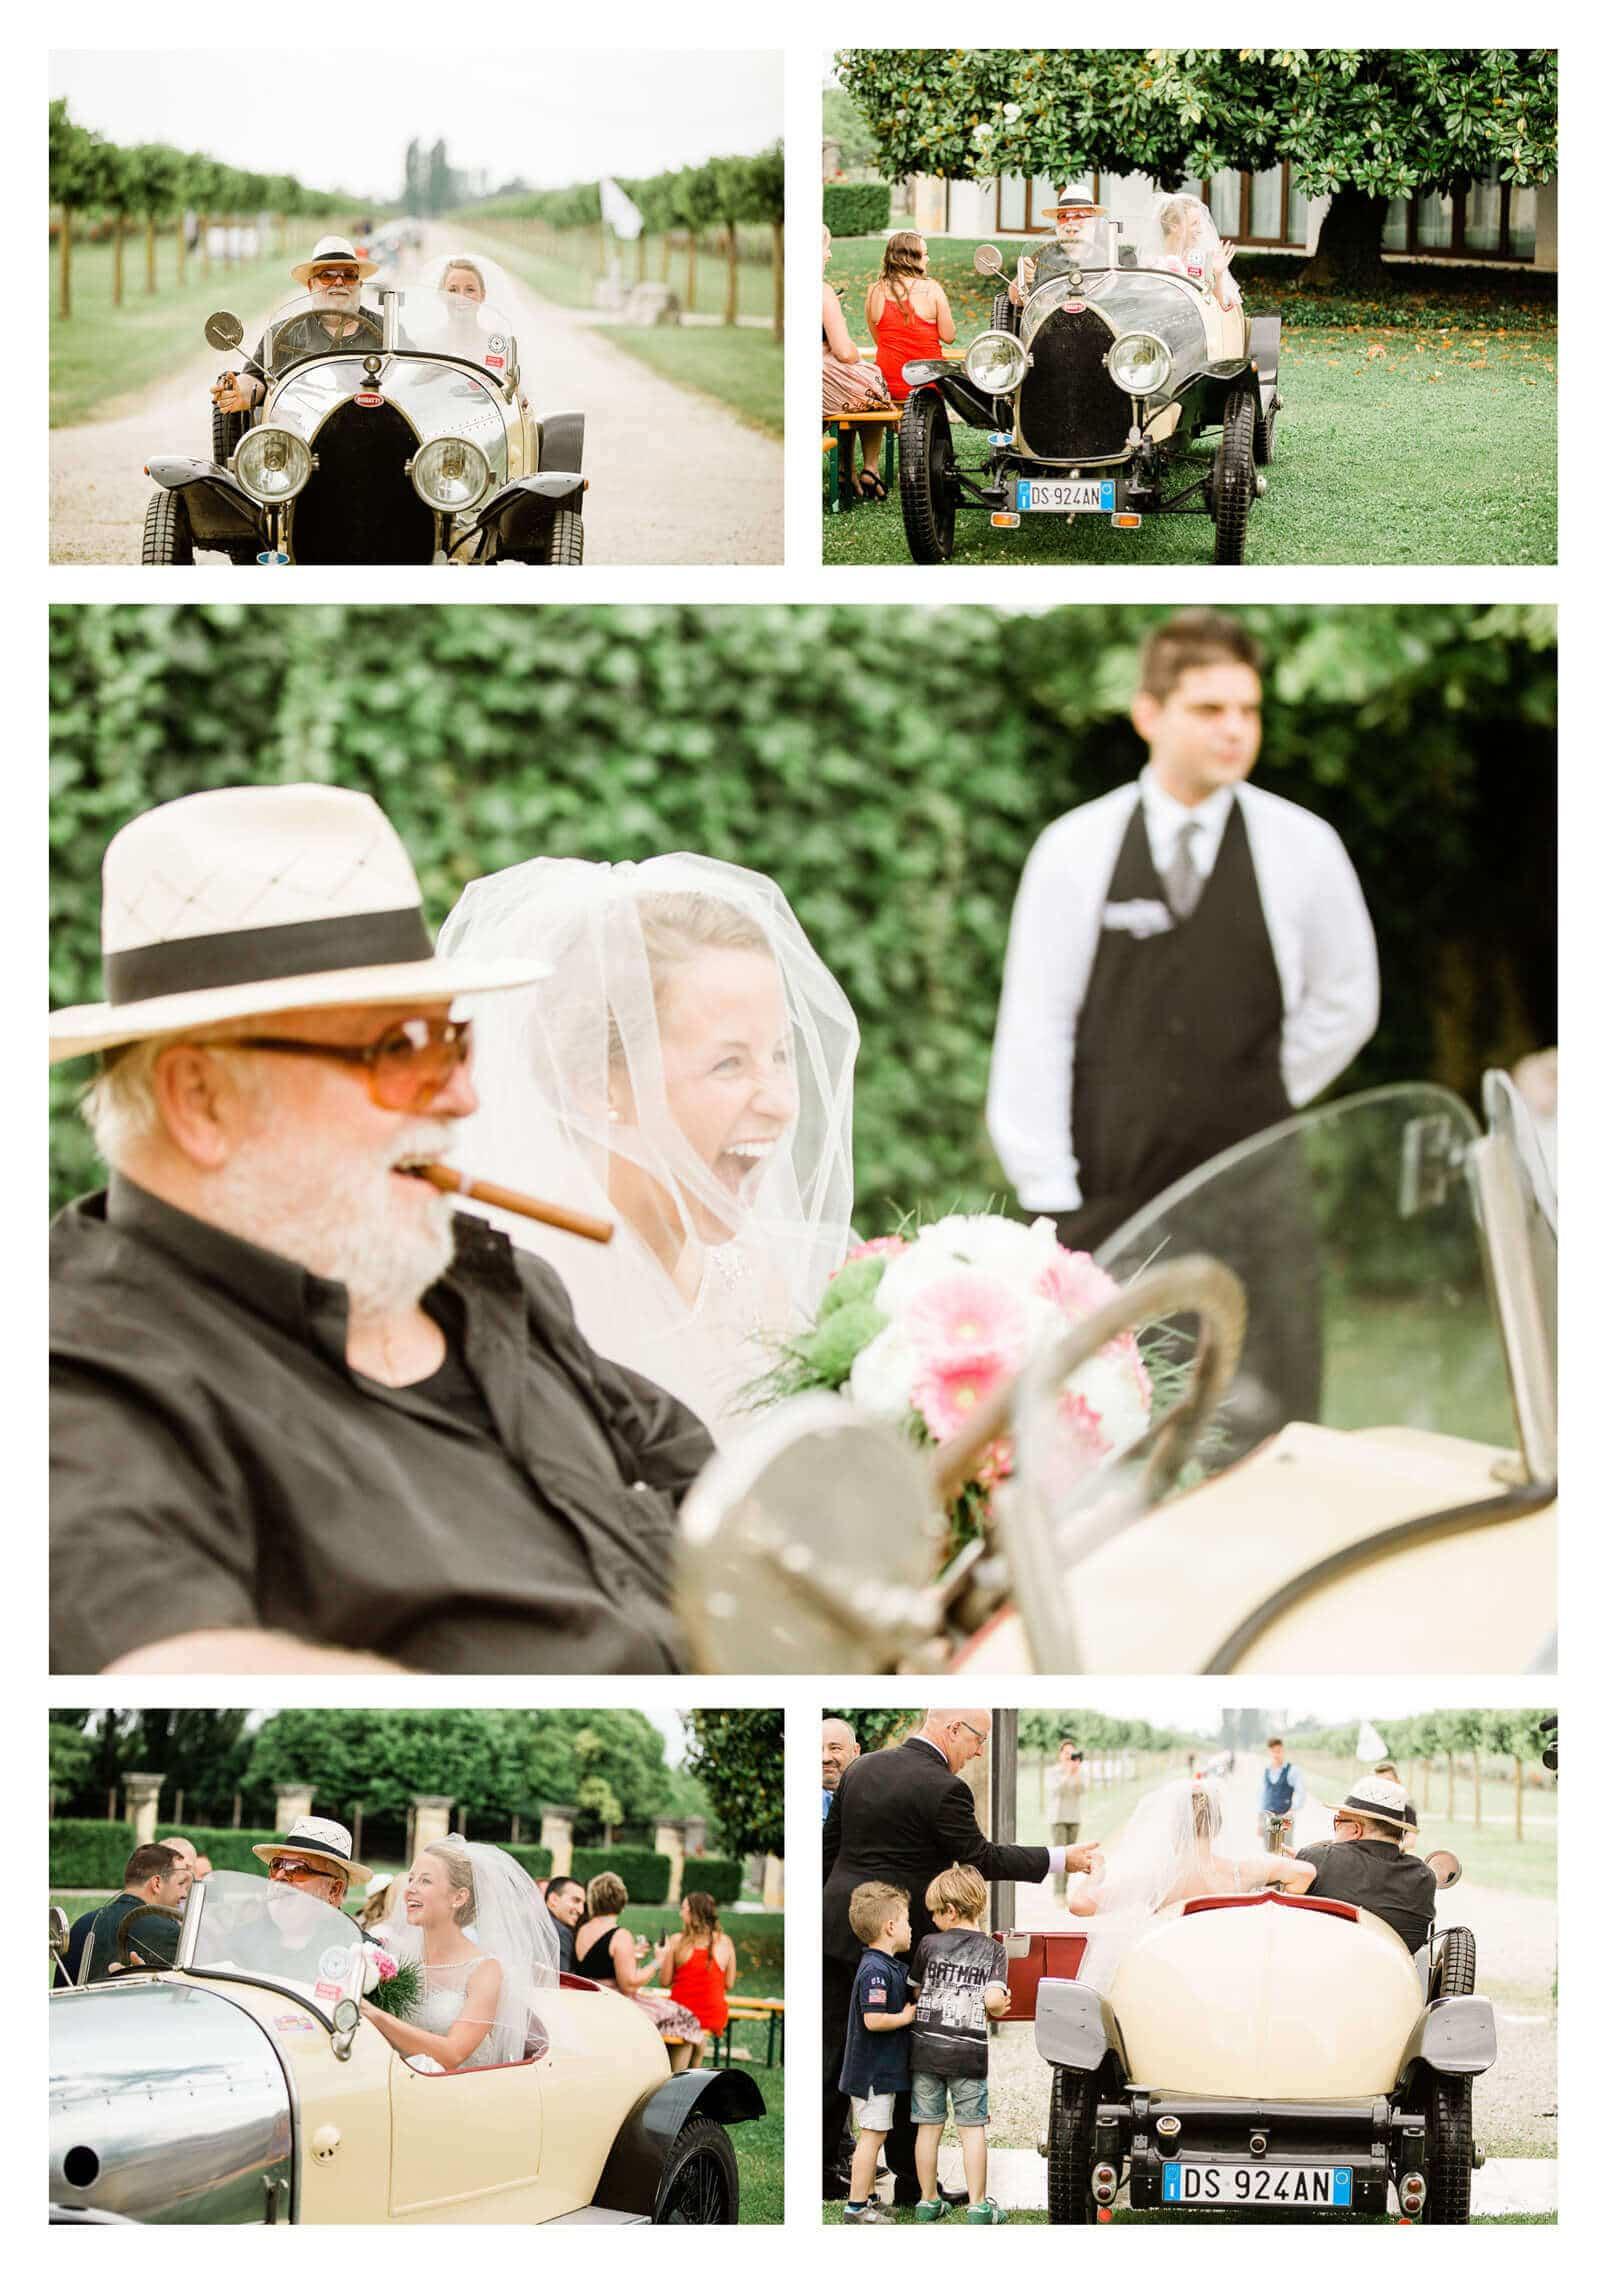 classic bugatti wedding car takes bride down the aisle | Italy wedding photographer